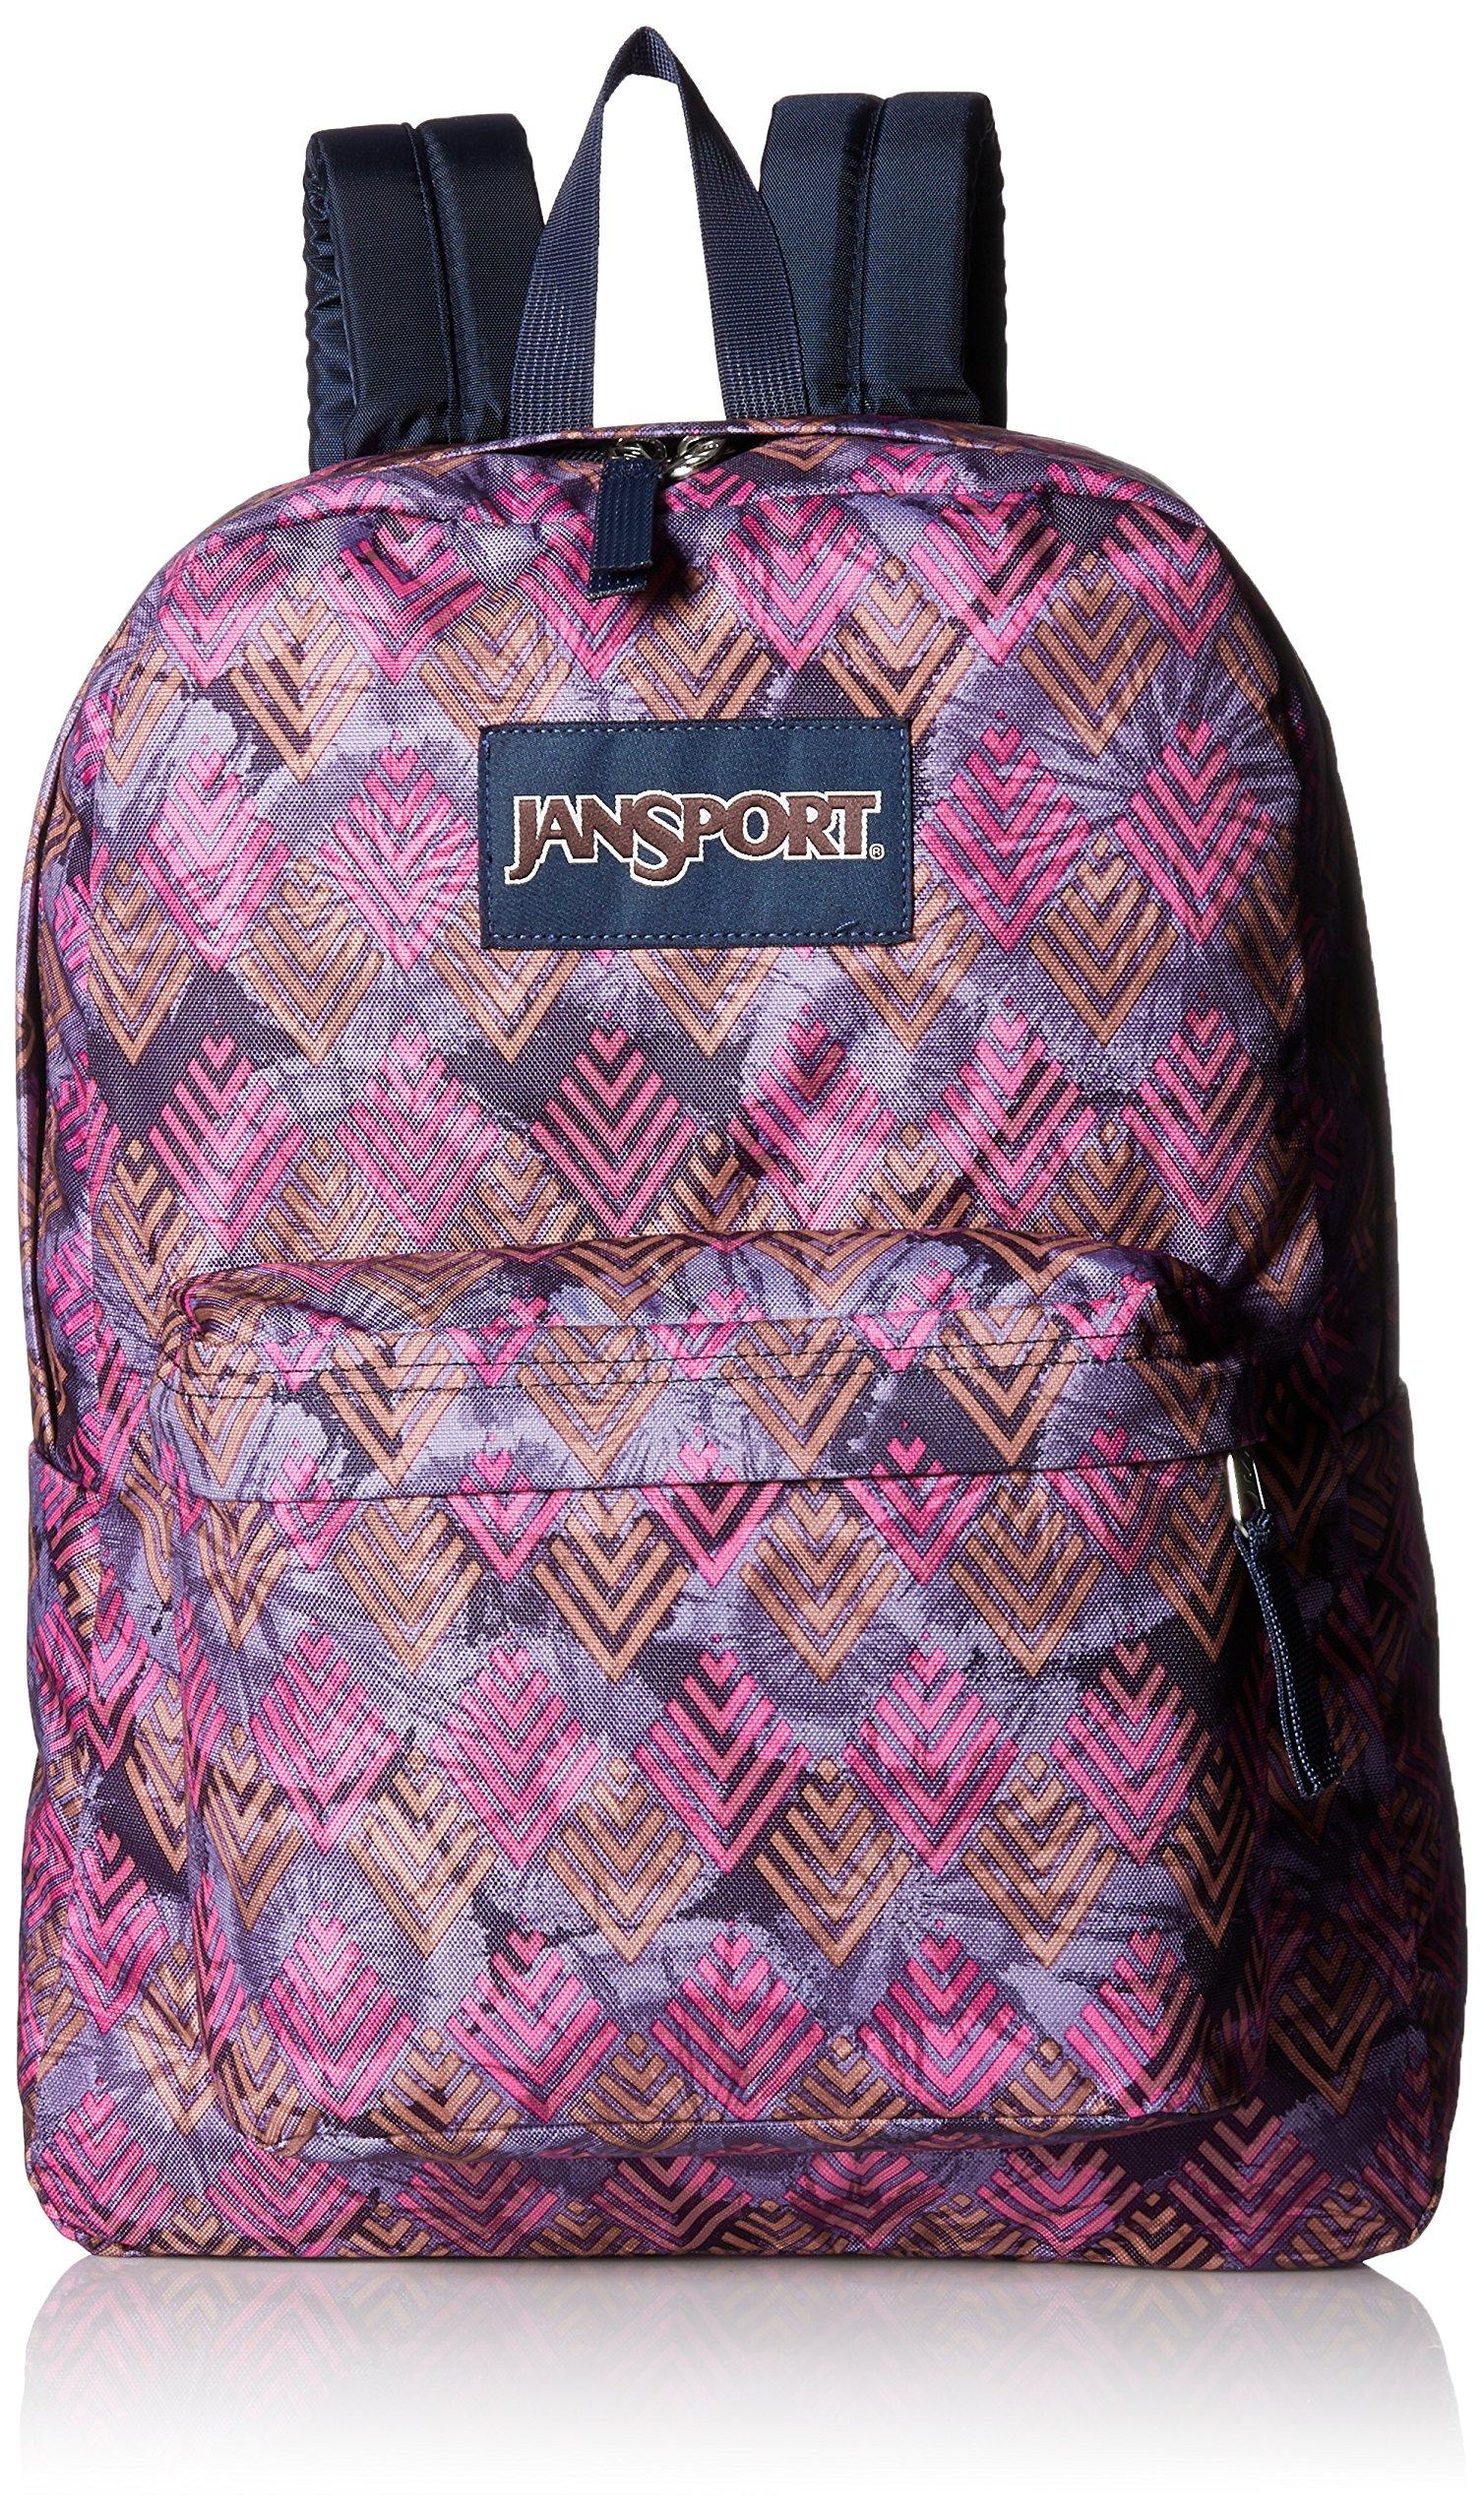 JanSport Superbreak Backpack- Sale Colors (Multi Diamond Arrows) by JanSport